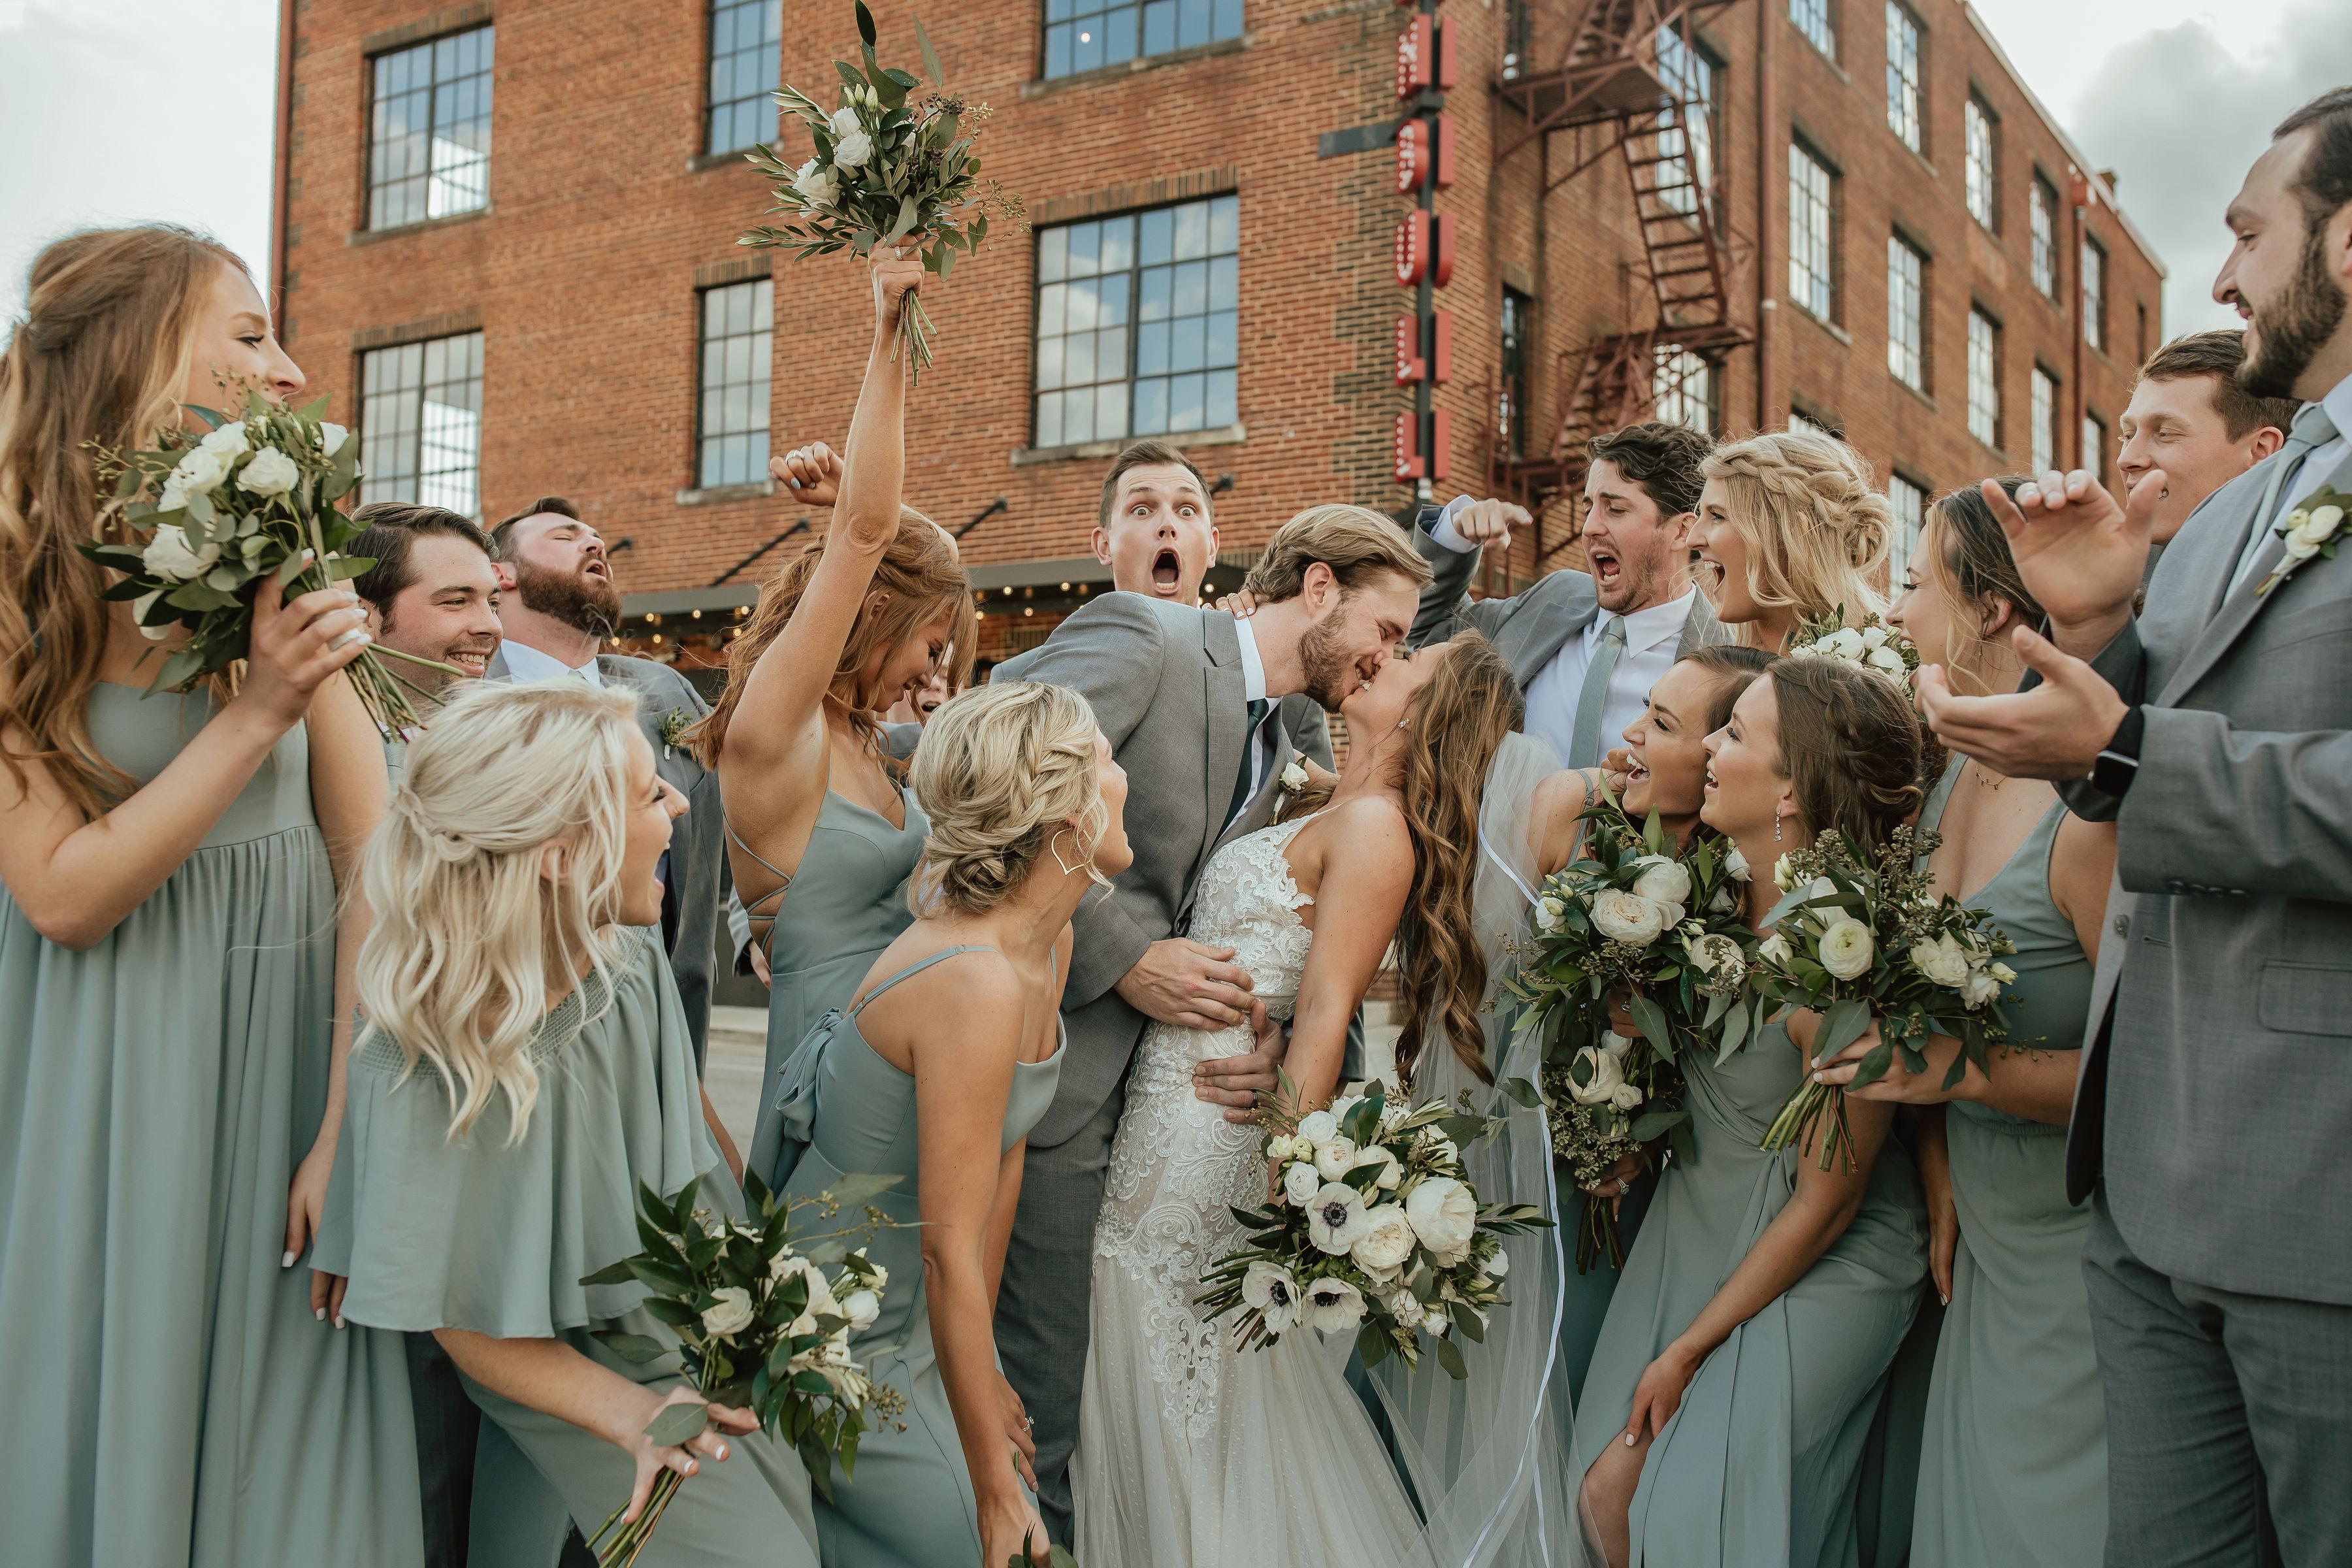 White Flowers Wedding Greenery, Lang Floral Designs, Chattanooga Wedding Florist, Chattanooga Wedding Coordinator